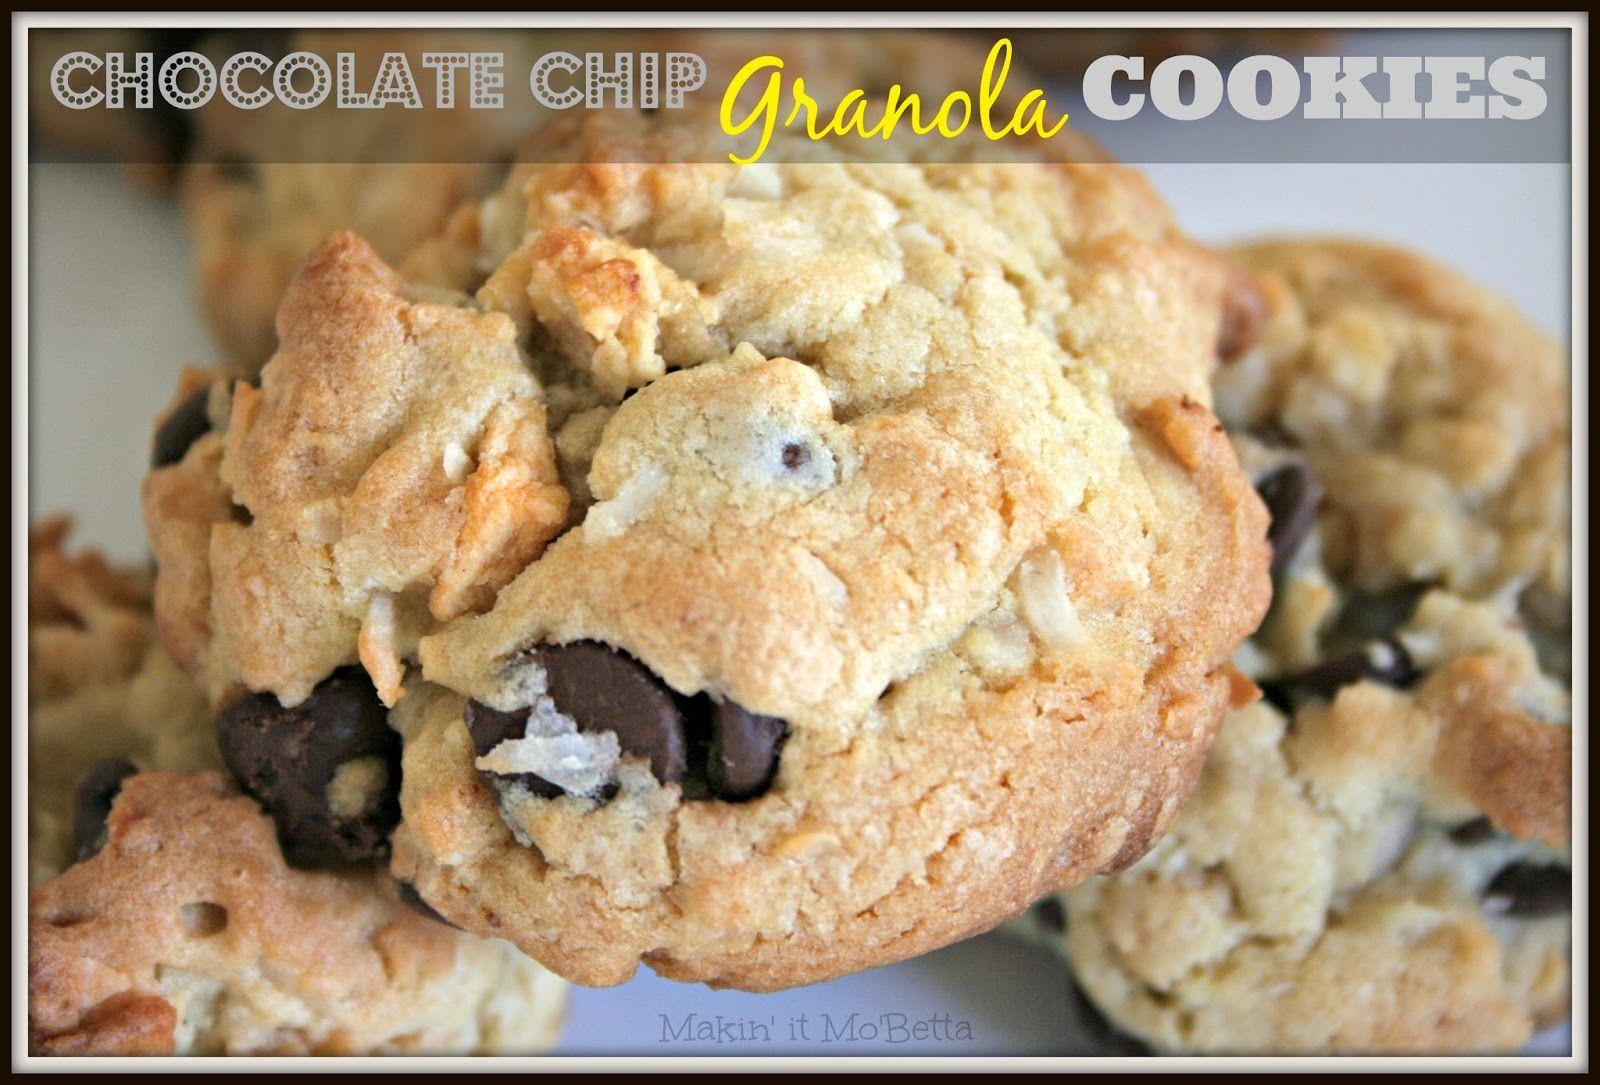 Makin' it Mo' Betta: Chocolate Chip Granola Cookies